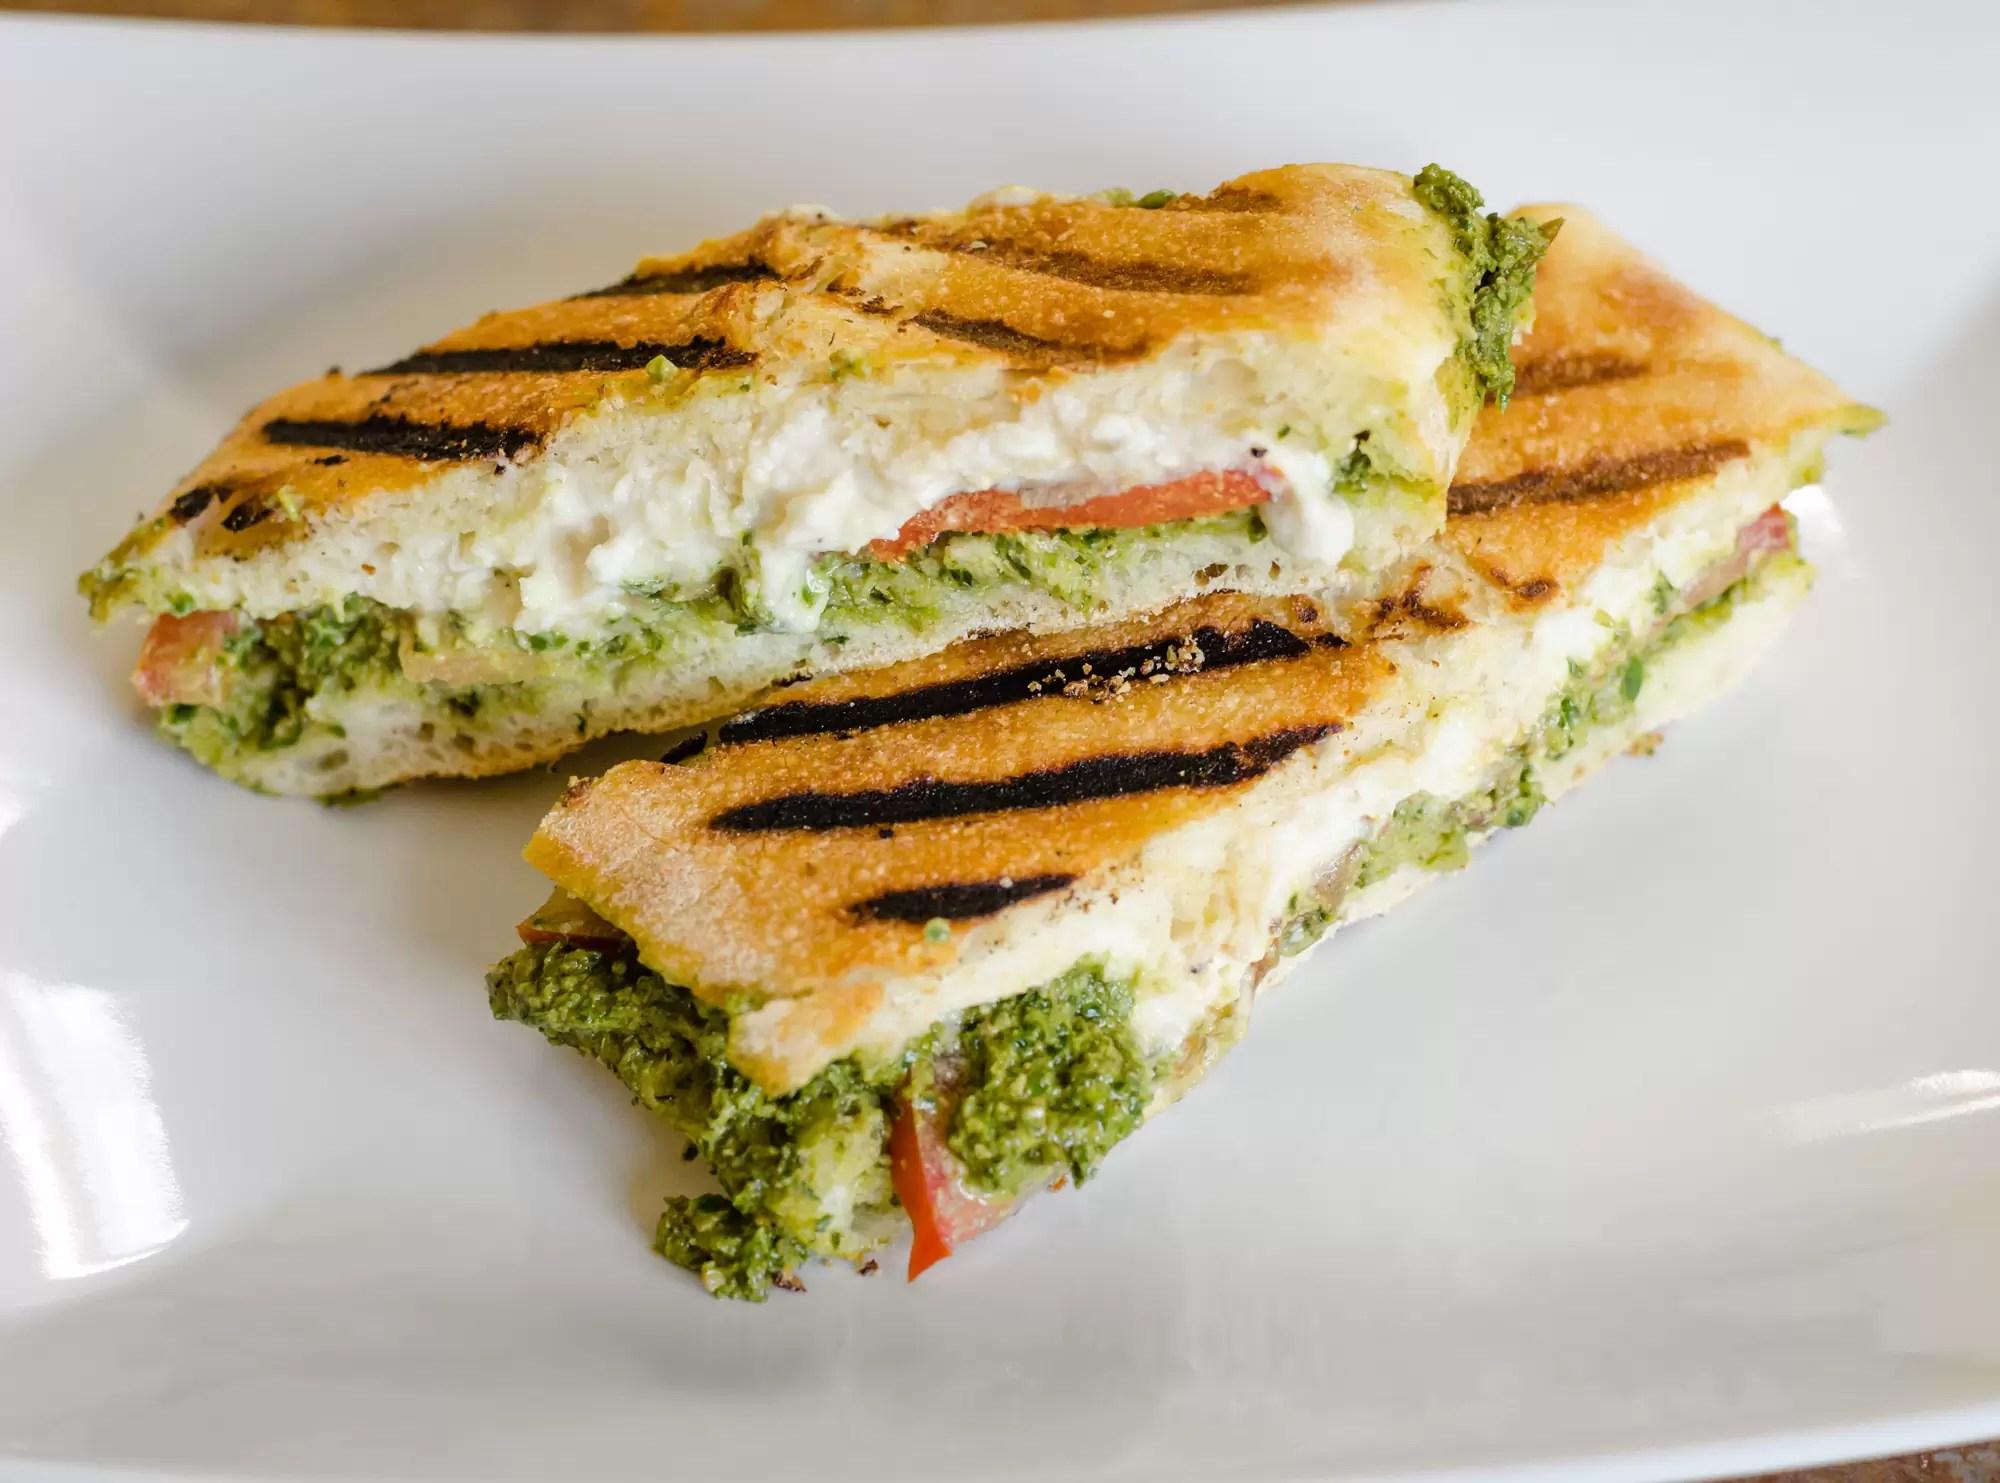 Vegan Pesto Panini Sandwich